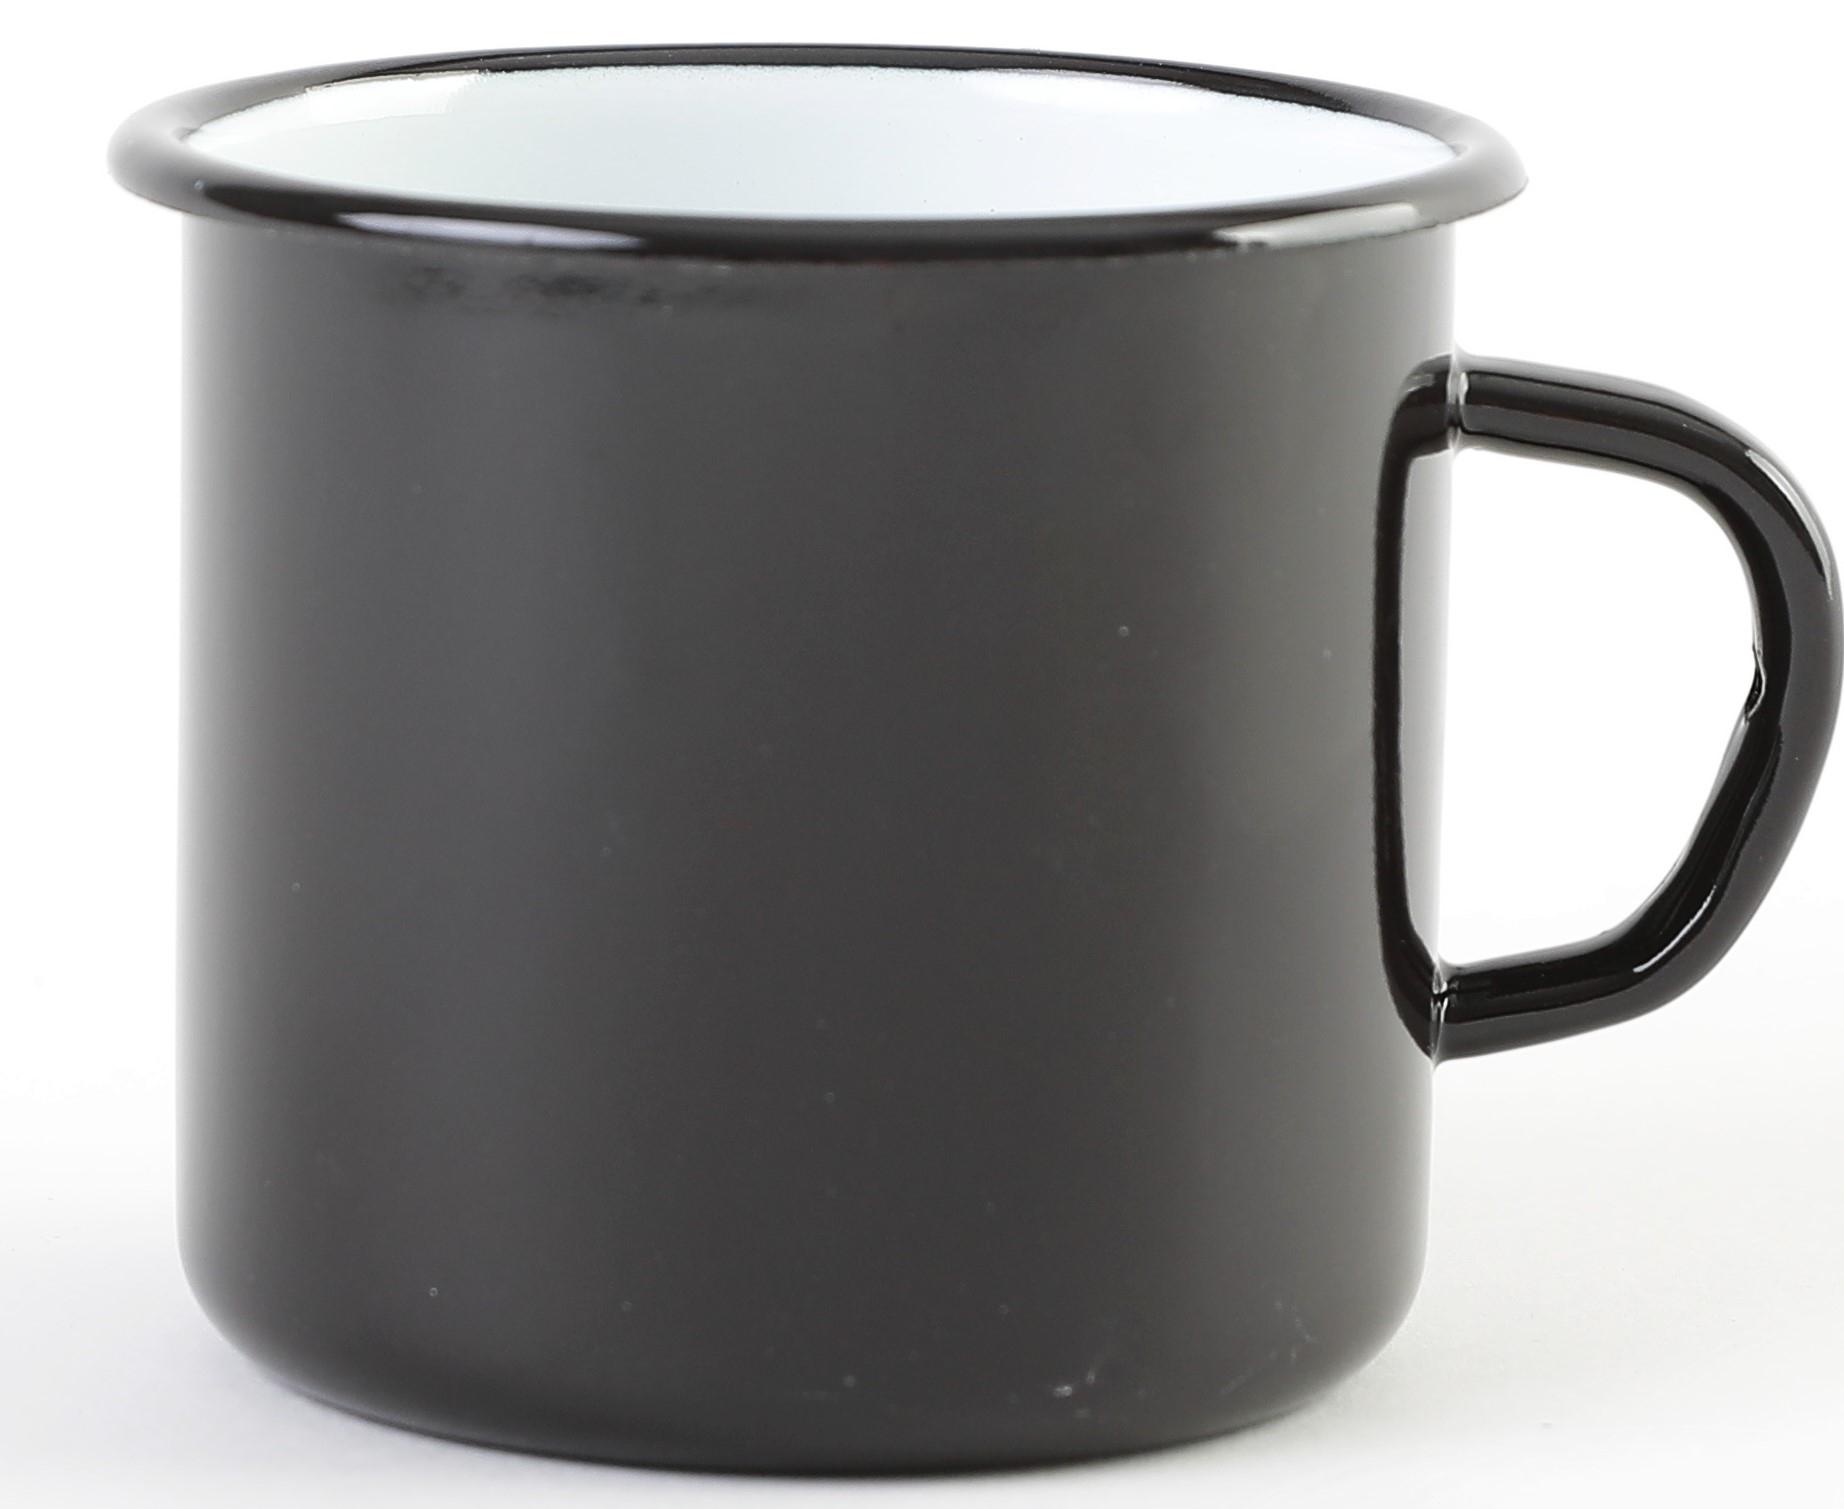 Hrnek d 8 (0,4l) černý, smalt